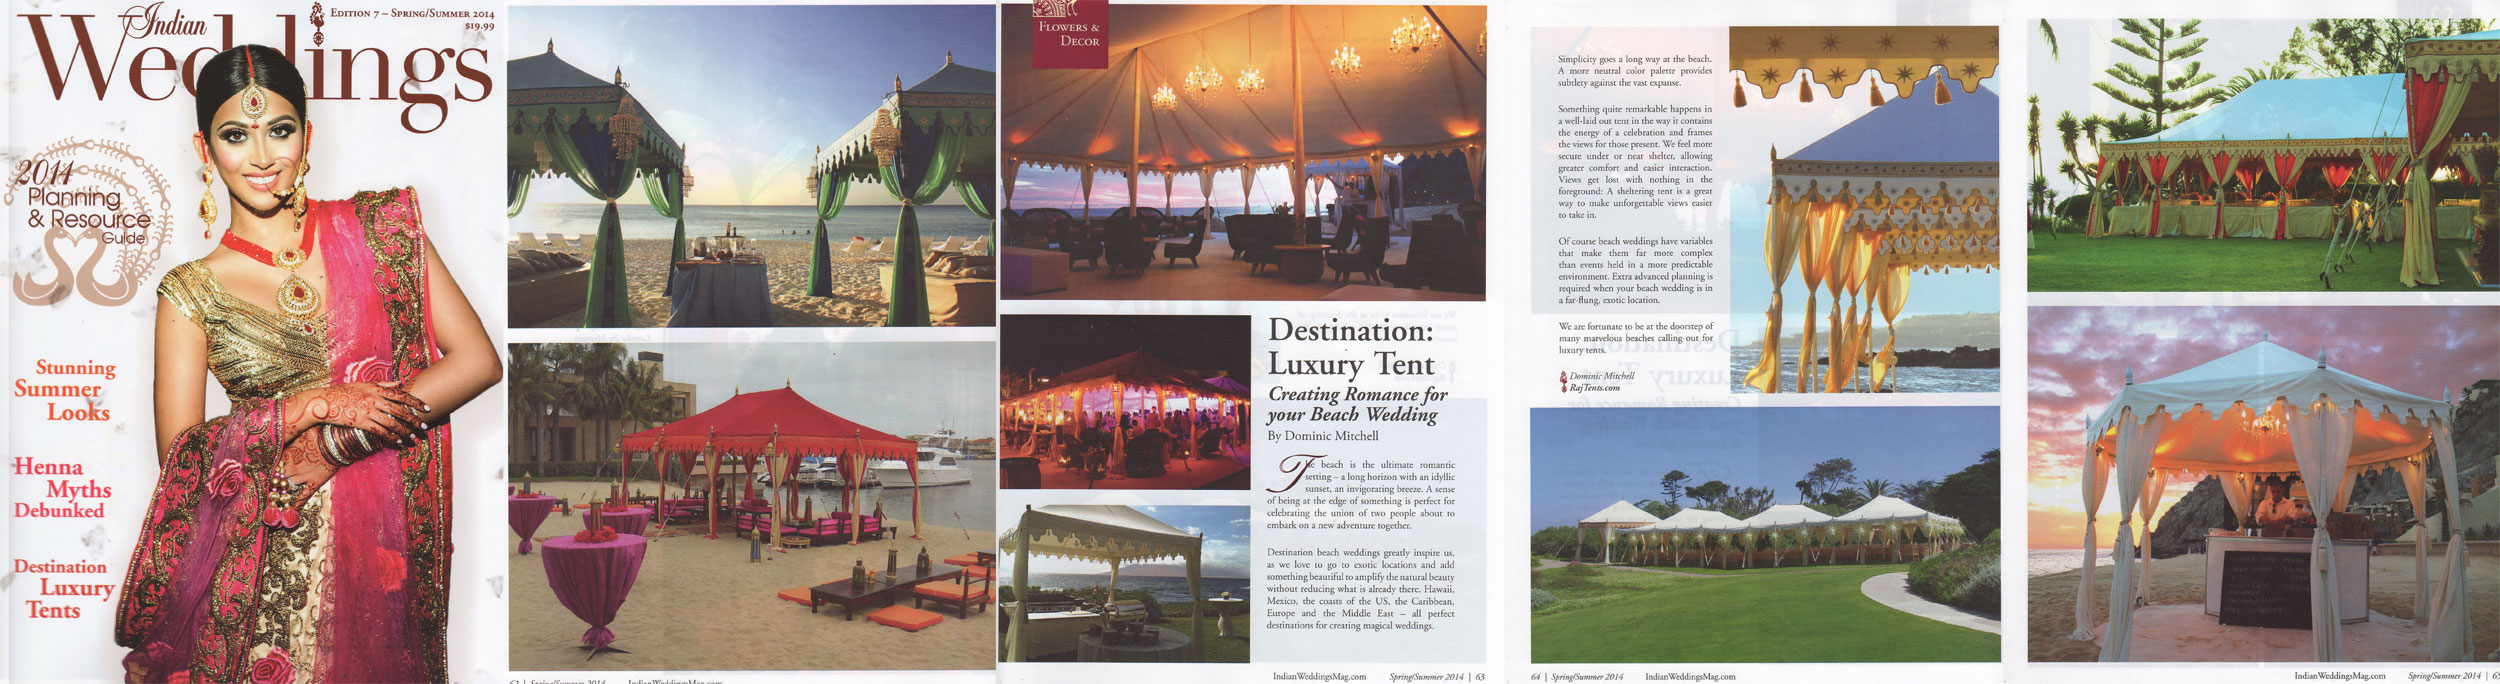 raj-tents-indian-weddings-magazine-luxury-2014.jpg